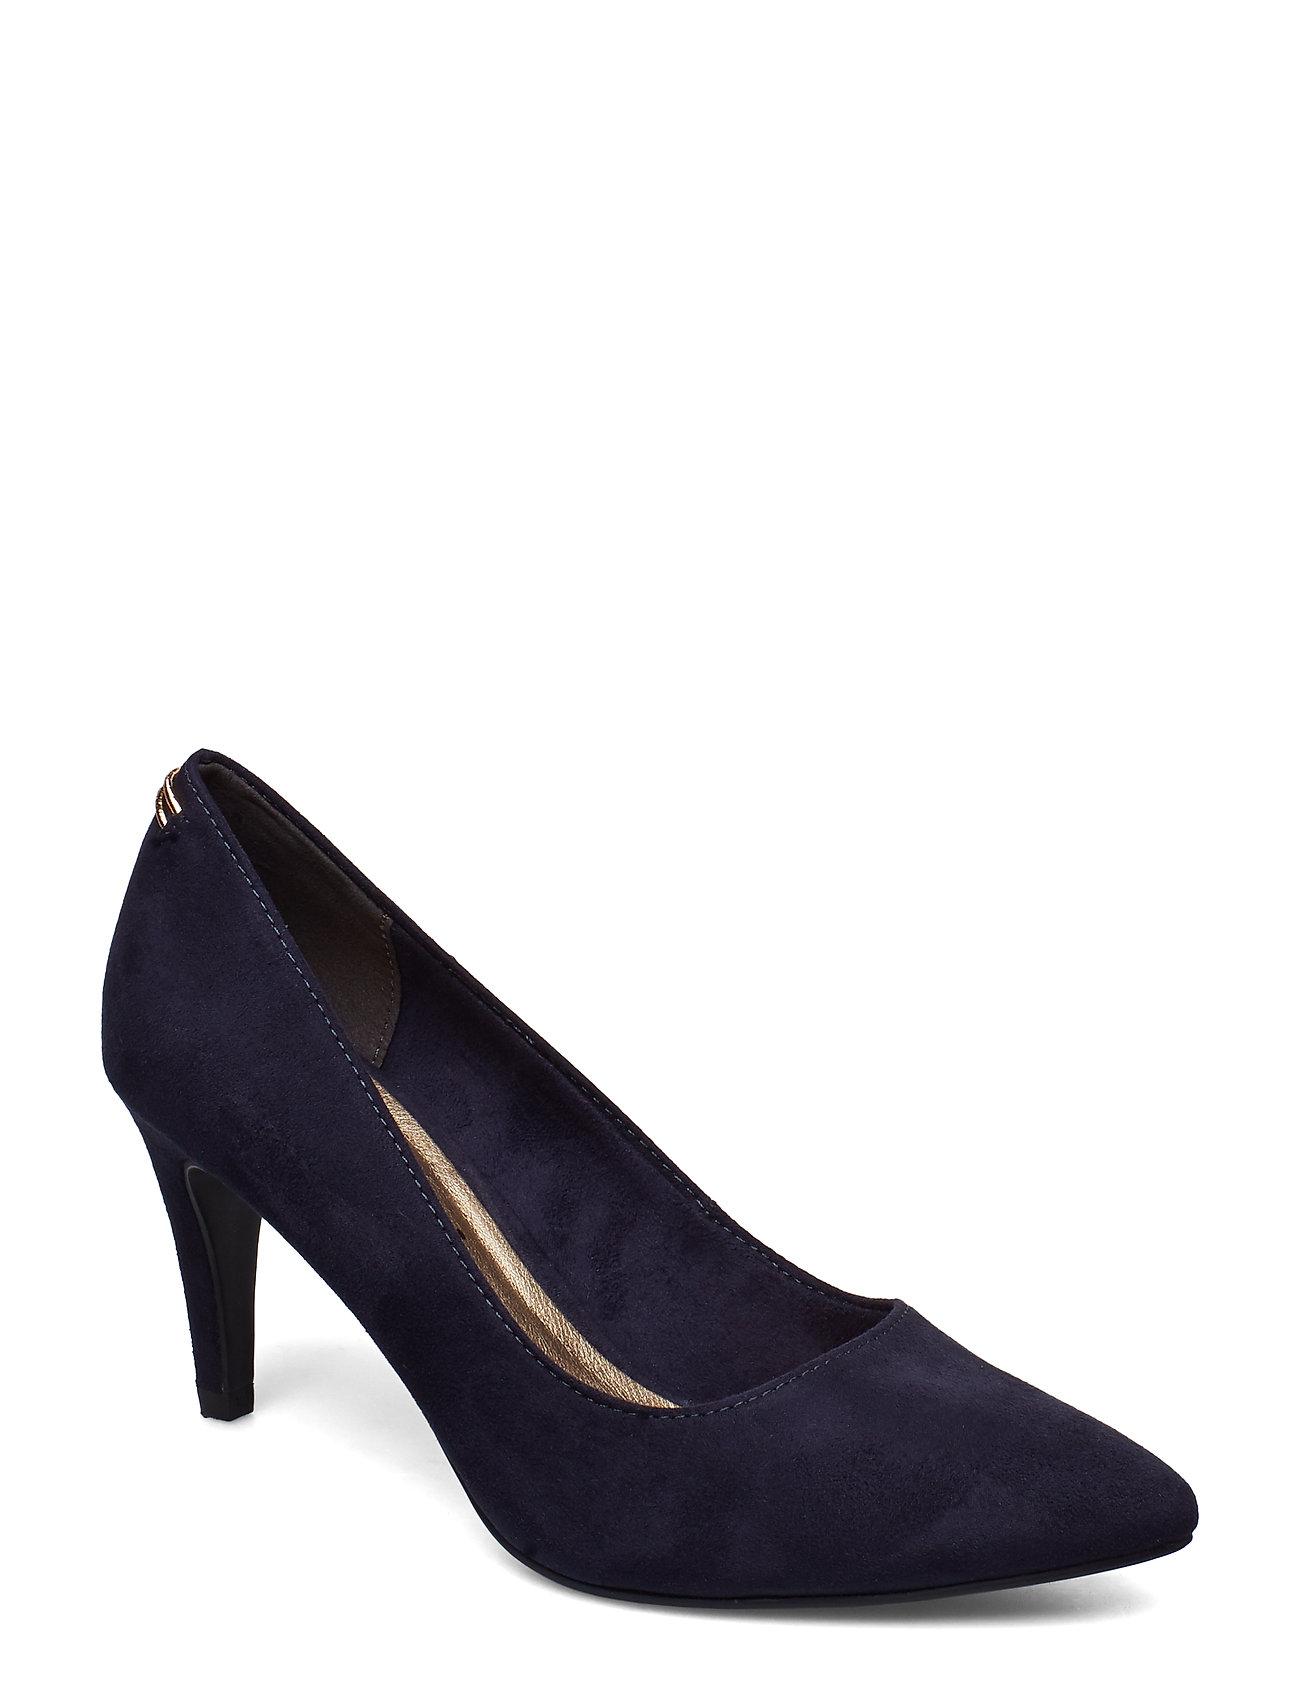 Tamaris Woms Court Shoe - NAVY